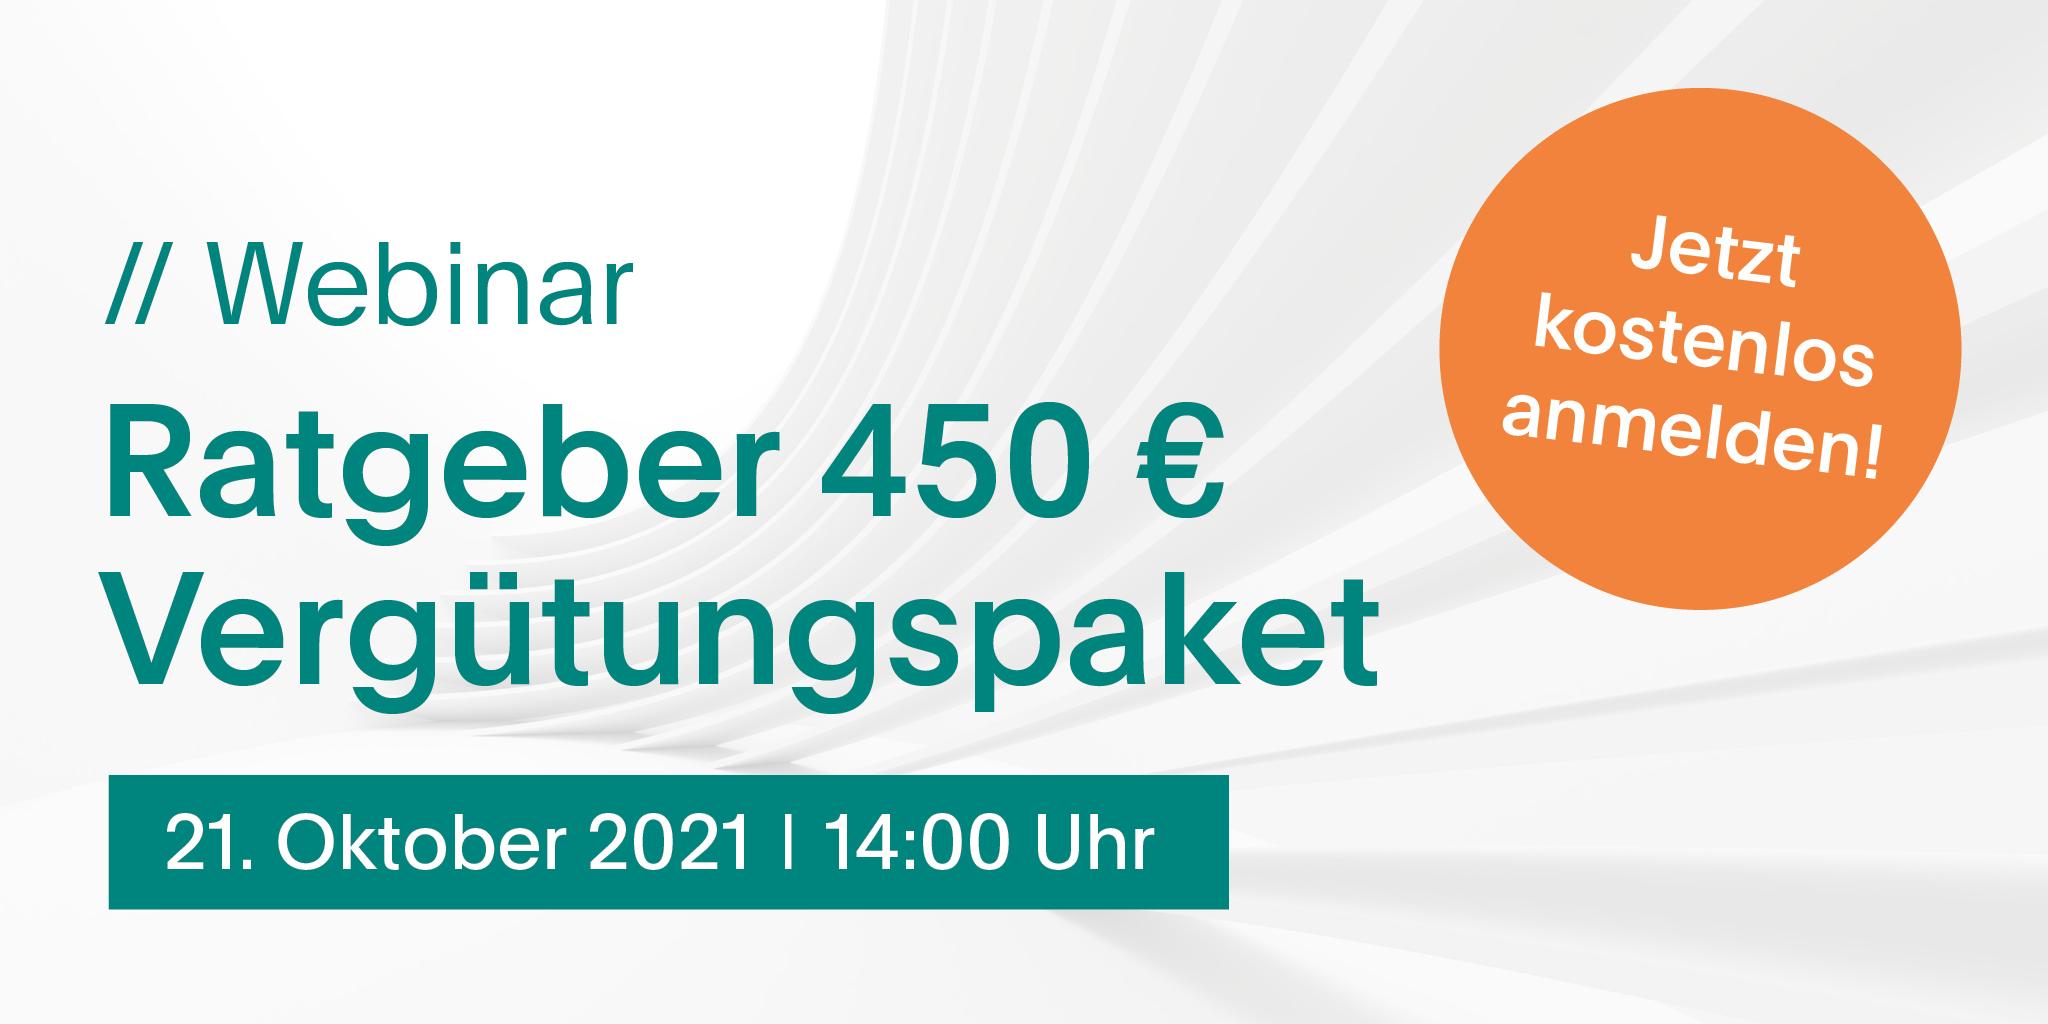 Franchise, Ratgeber Steuern, Webinar: Webinar: Ratgeber 450 € Vergütungspaket